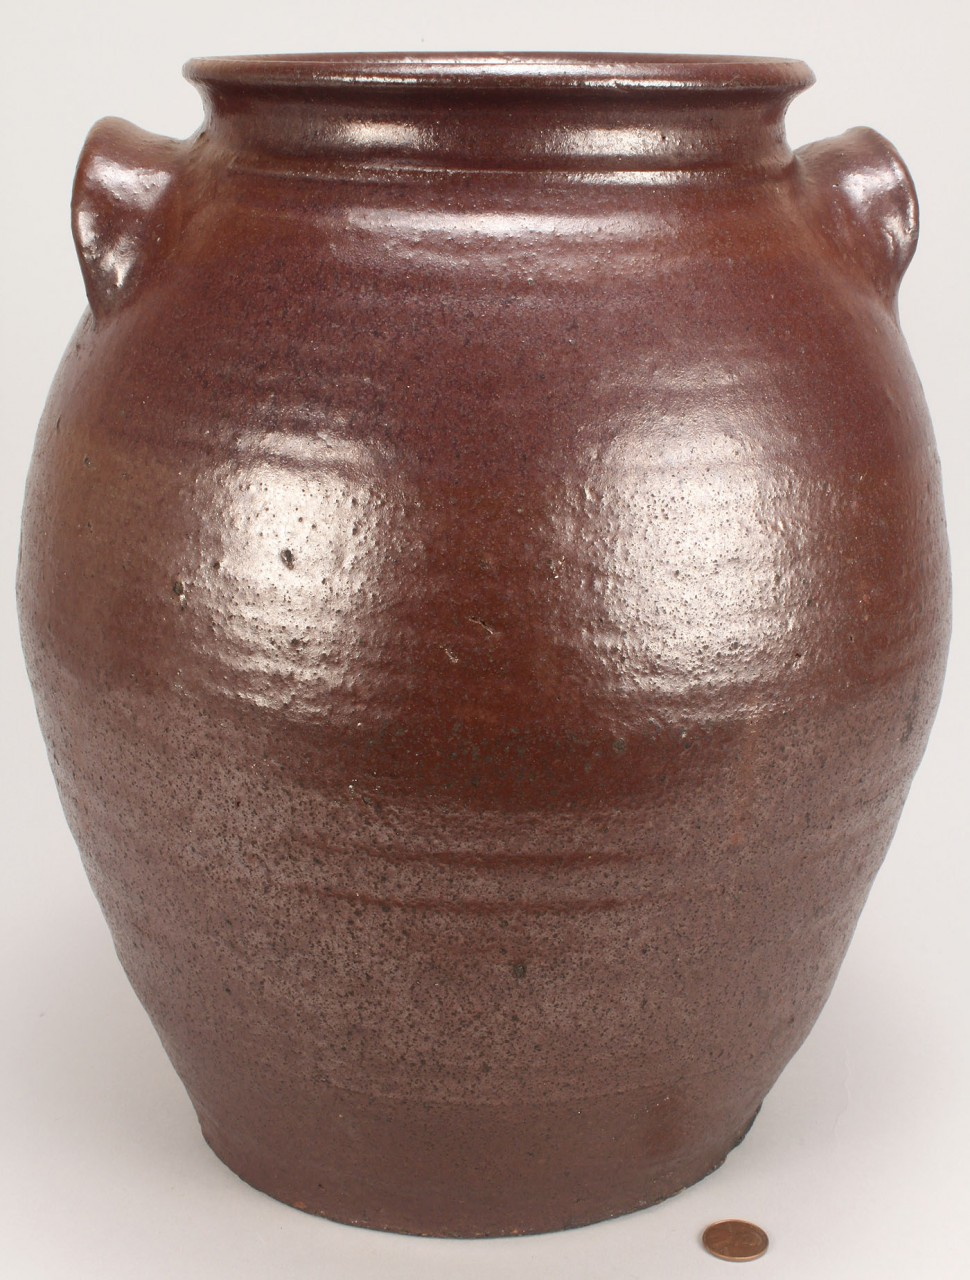 Lot 96: Large South Carolina  Alkaline Glazed Storage Jar